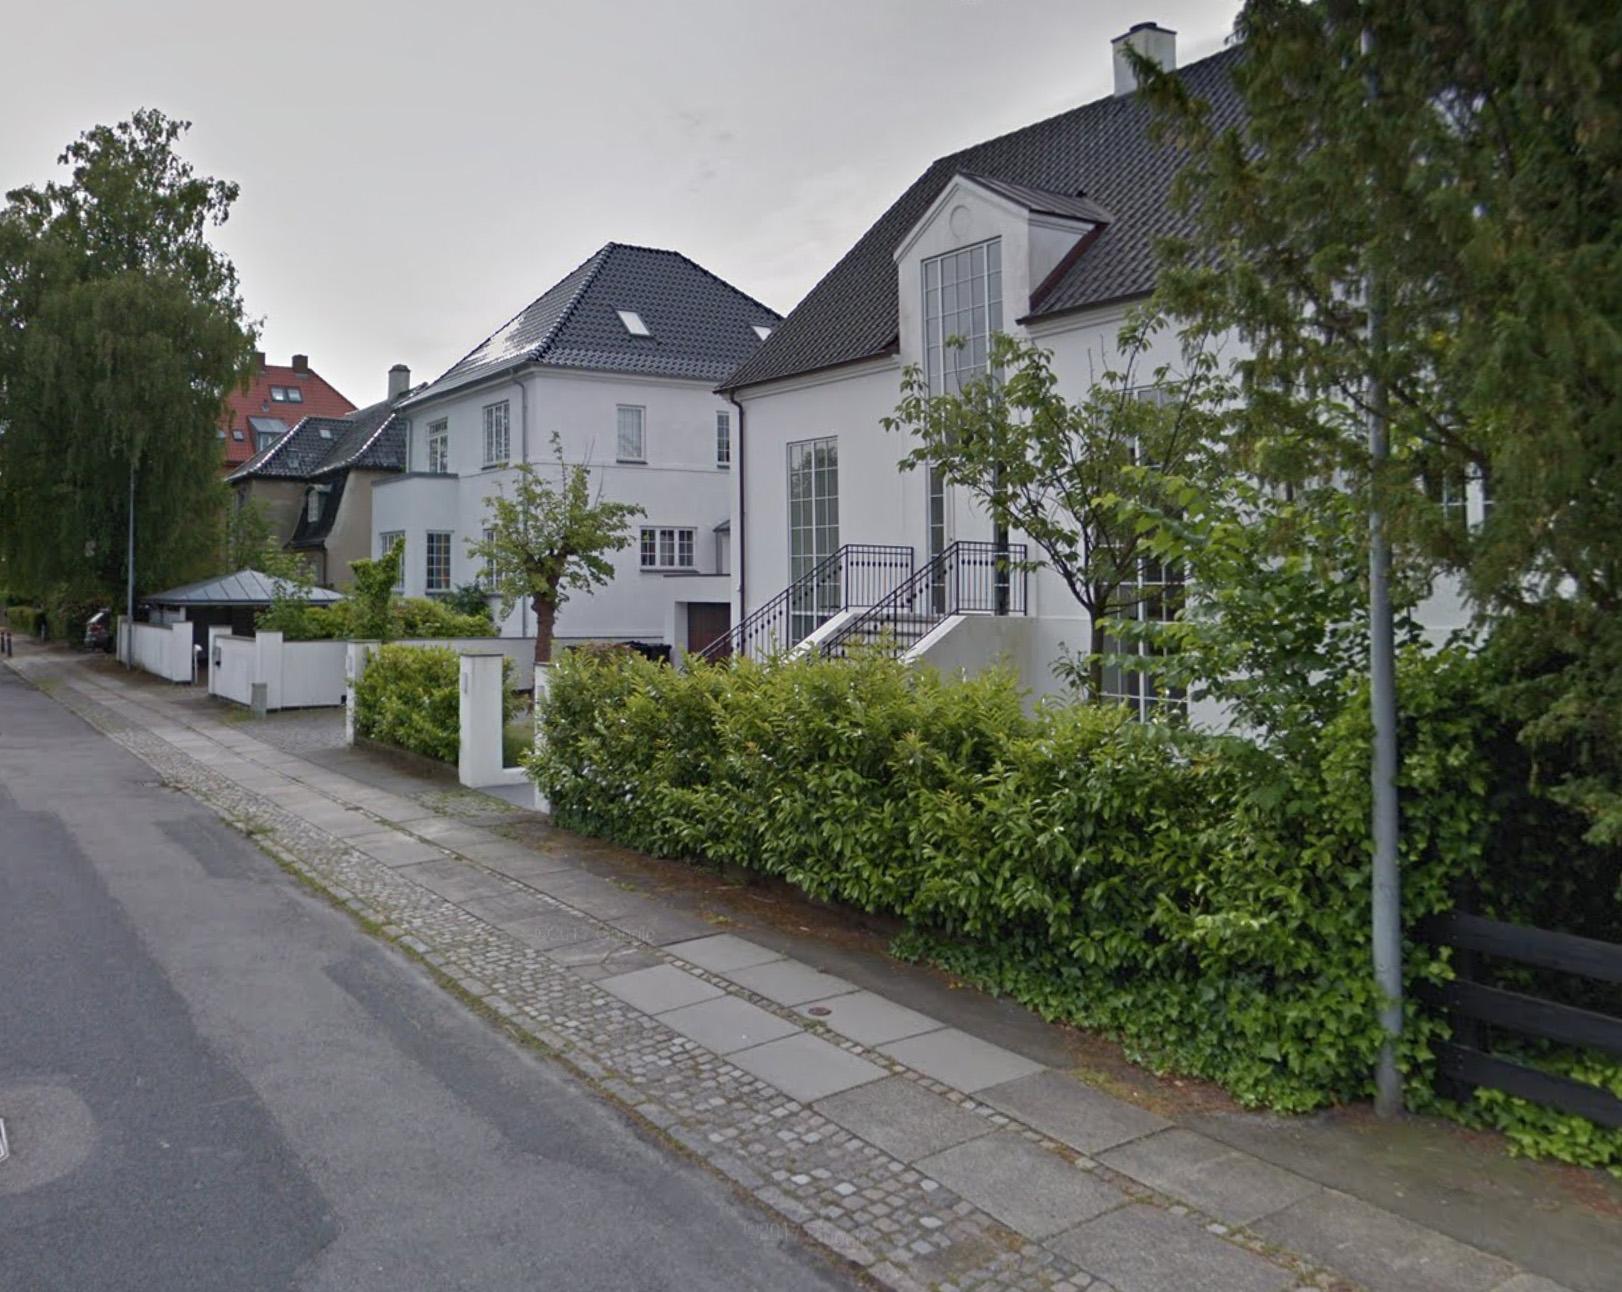 GARDES ALLE, HELLERUP - Bygherre: PrivatkundeEntrepriseform: HovedentrepriseProjekttype: Nybyggeri af luksus villa